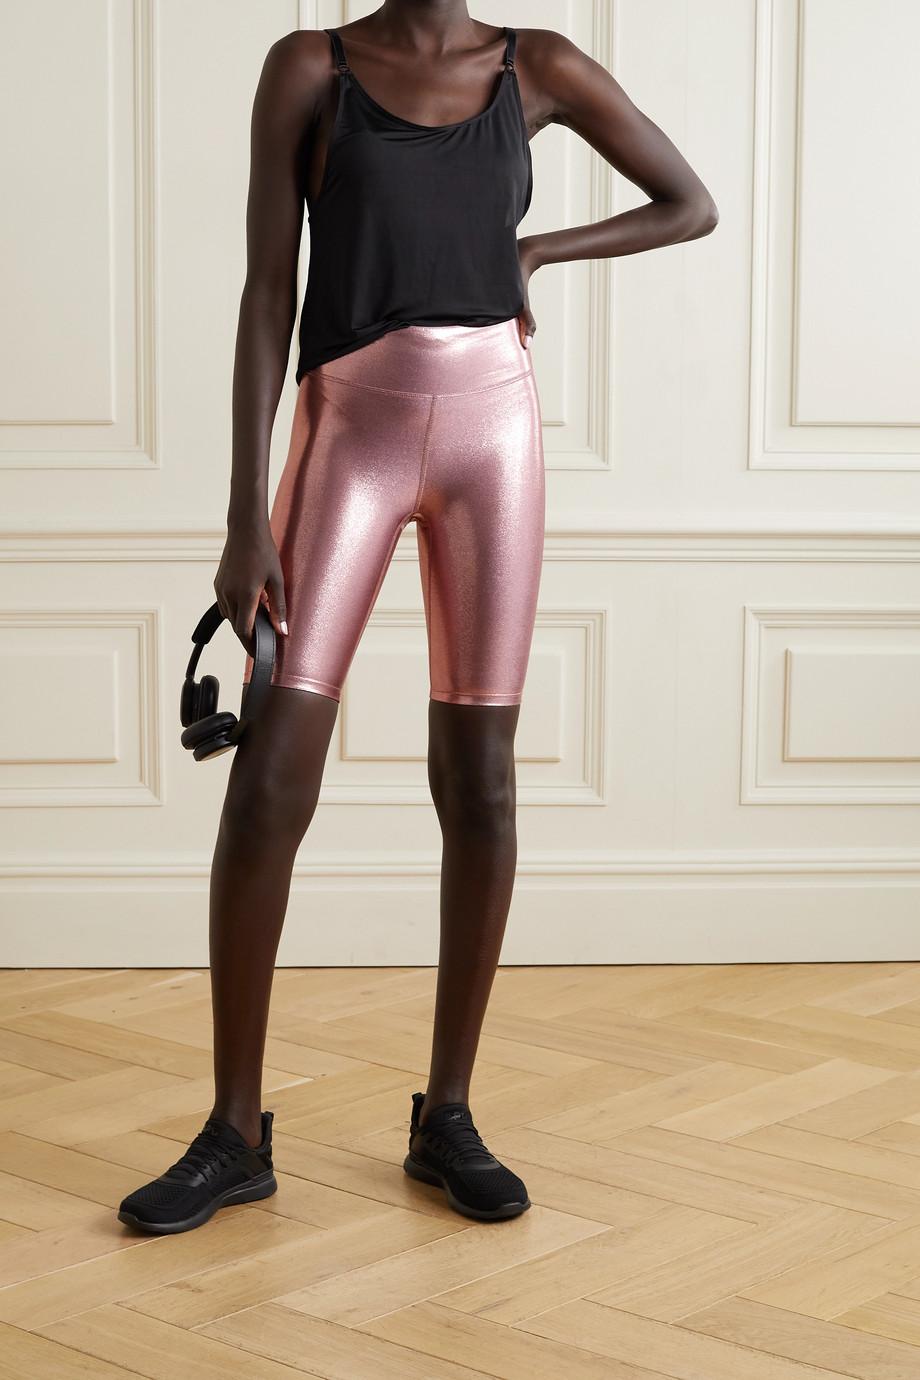 Heroine Sport Marvel metallic stretch shorts